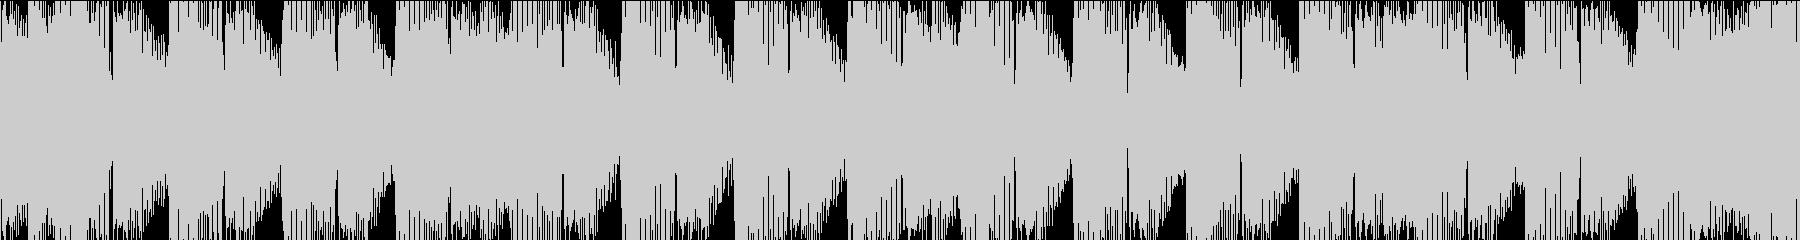 K-Popクラブ系ハードなEDMループSの未再生の波形